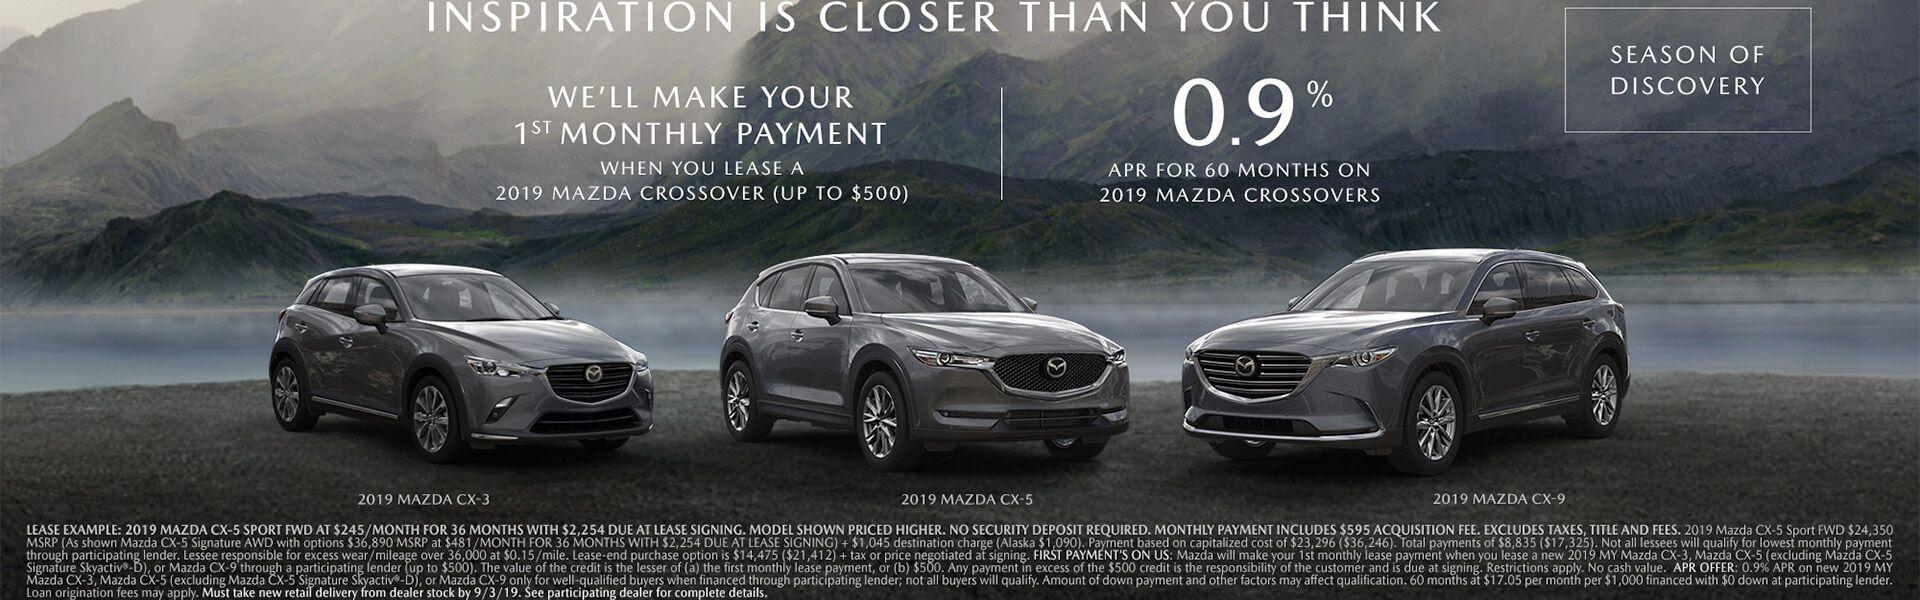 Las Vegas Used Cars >> Mazda Dealership Las Vegas Nv Used Cars Earnhardt Mazda Las Vegas